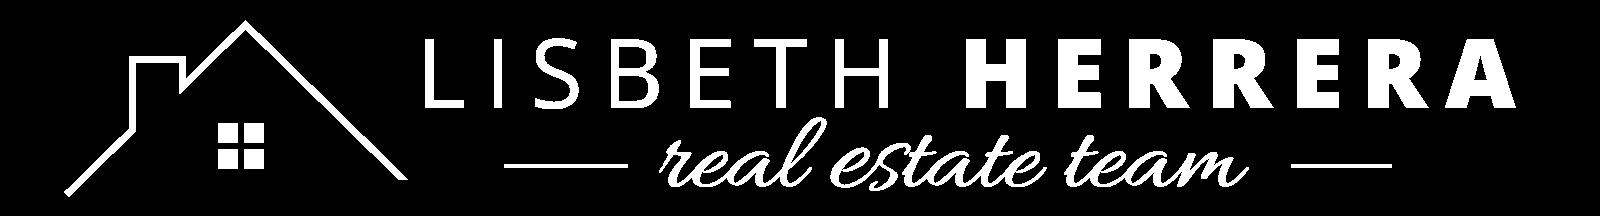 Lisbeth Herrera Team logo